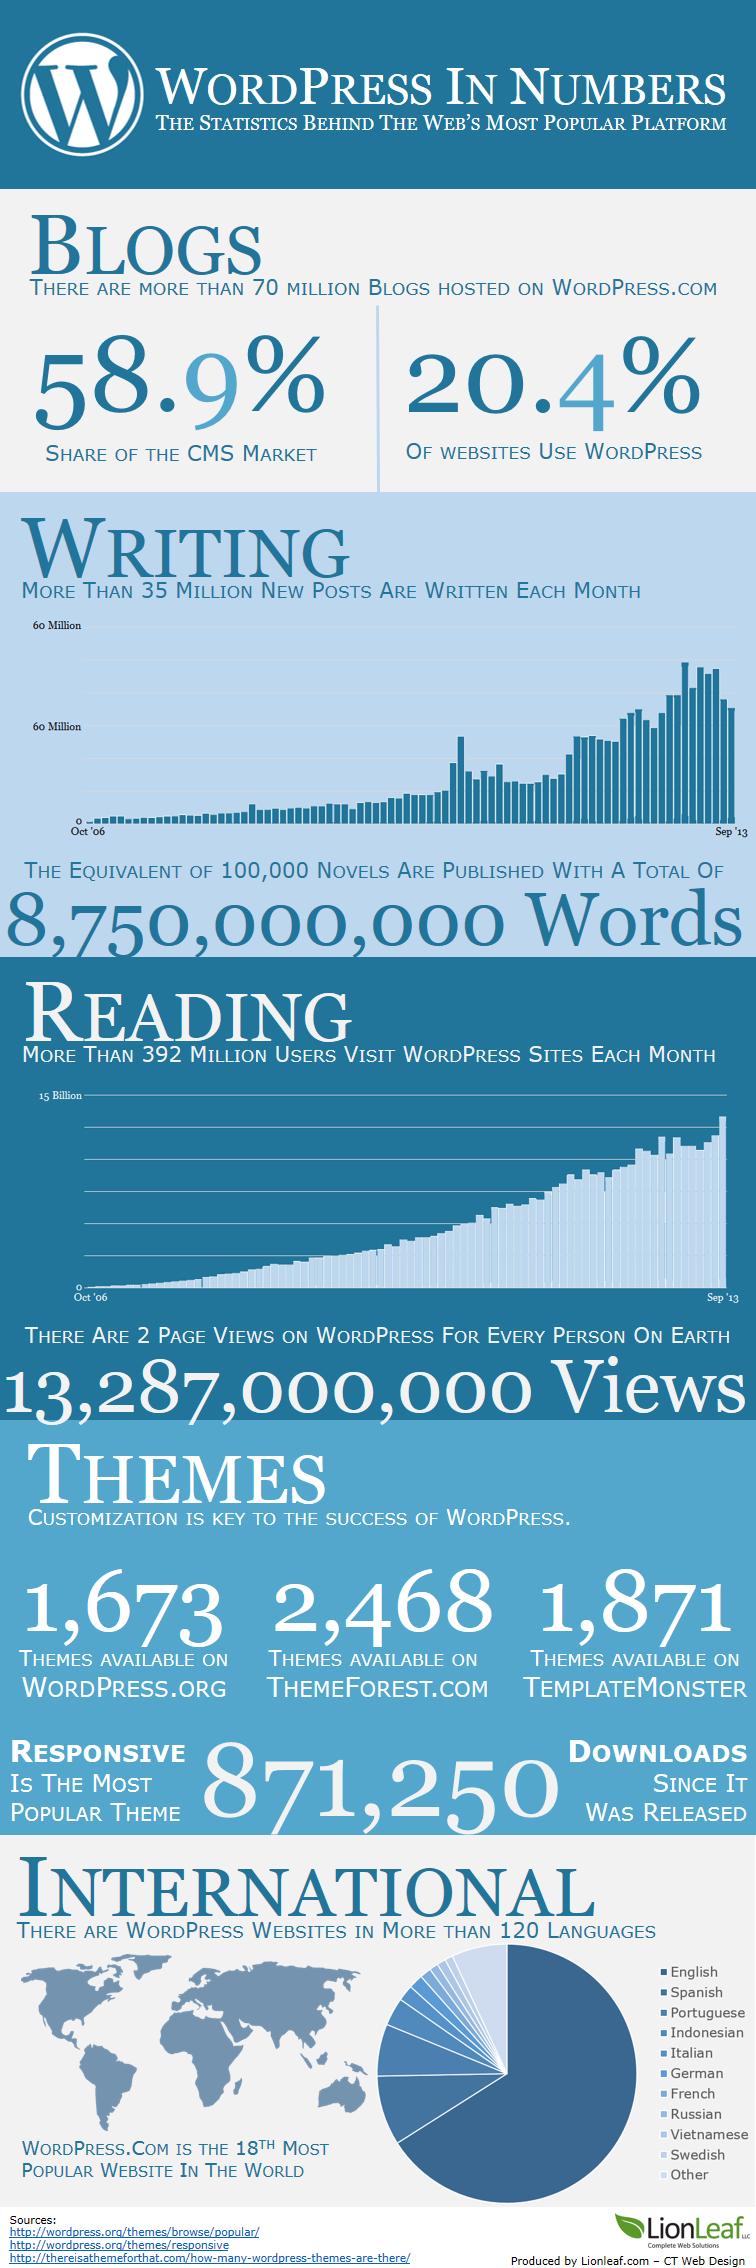 WordPress Statistics and Trends